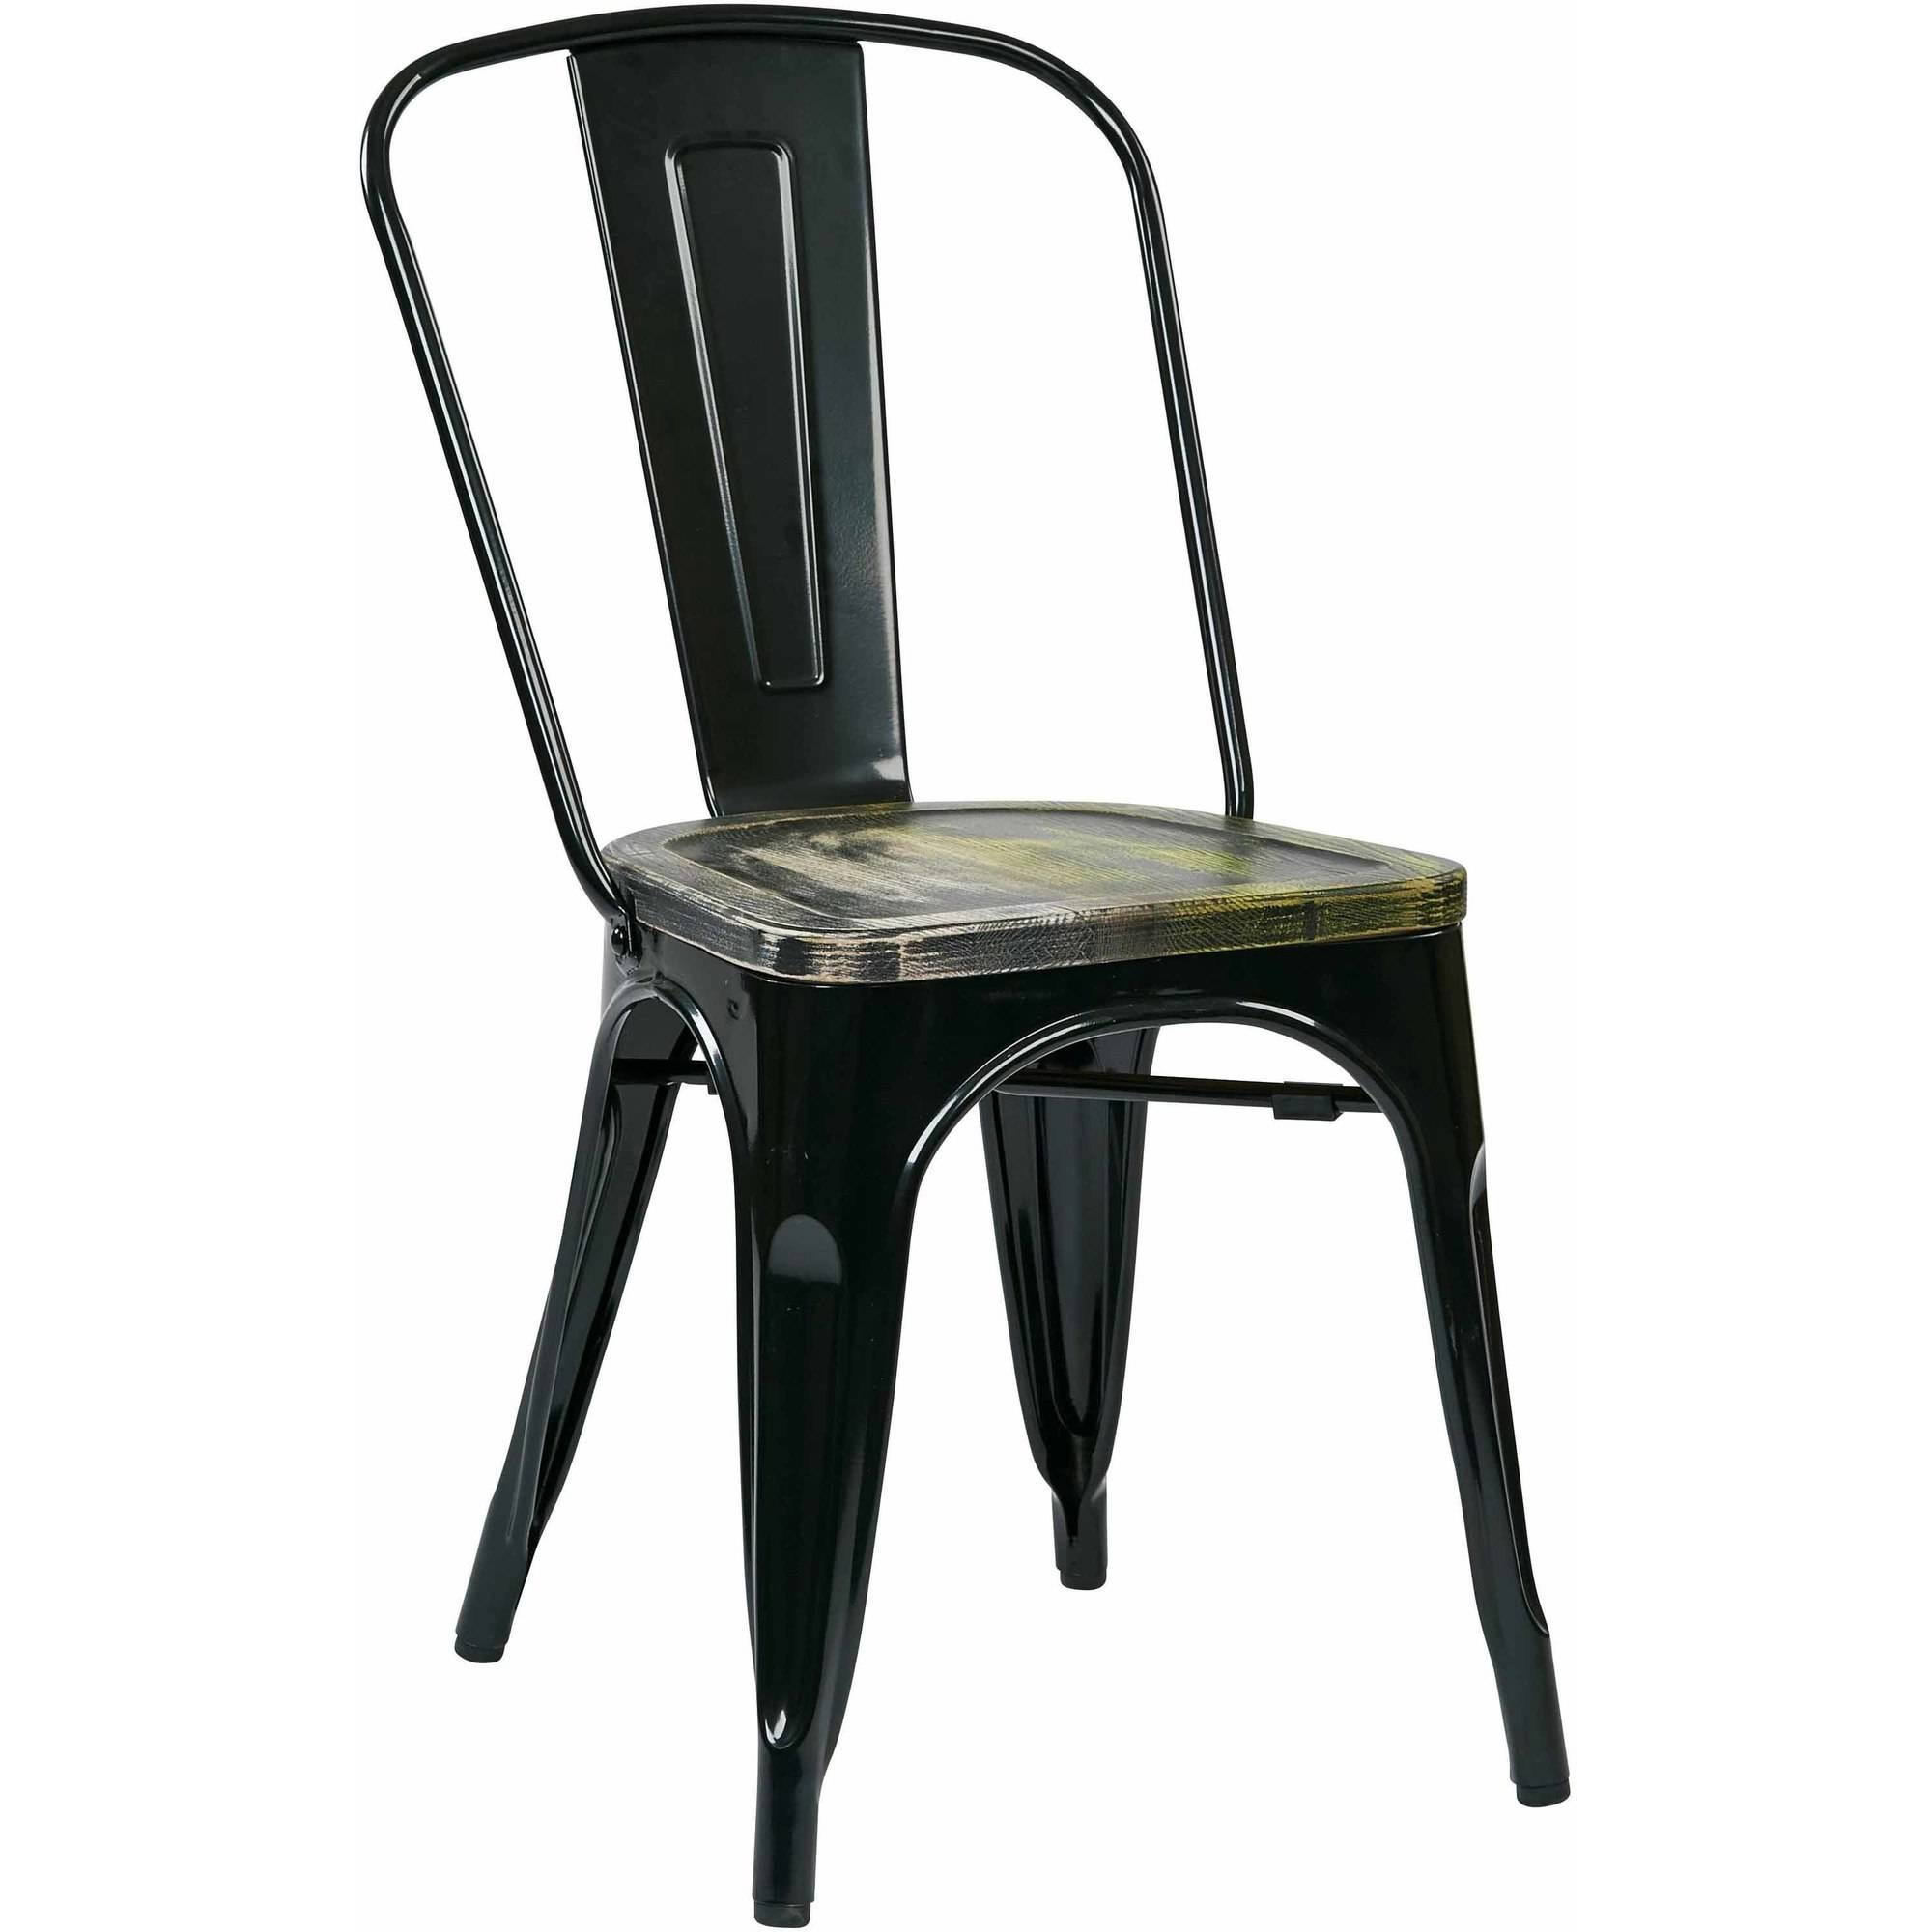 Bristow Metal Chair with Vintage Wood Seat, 4 Pack